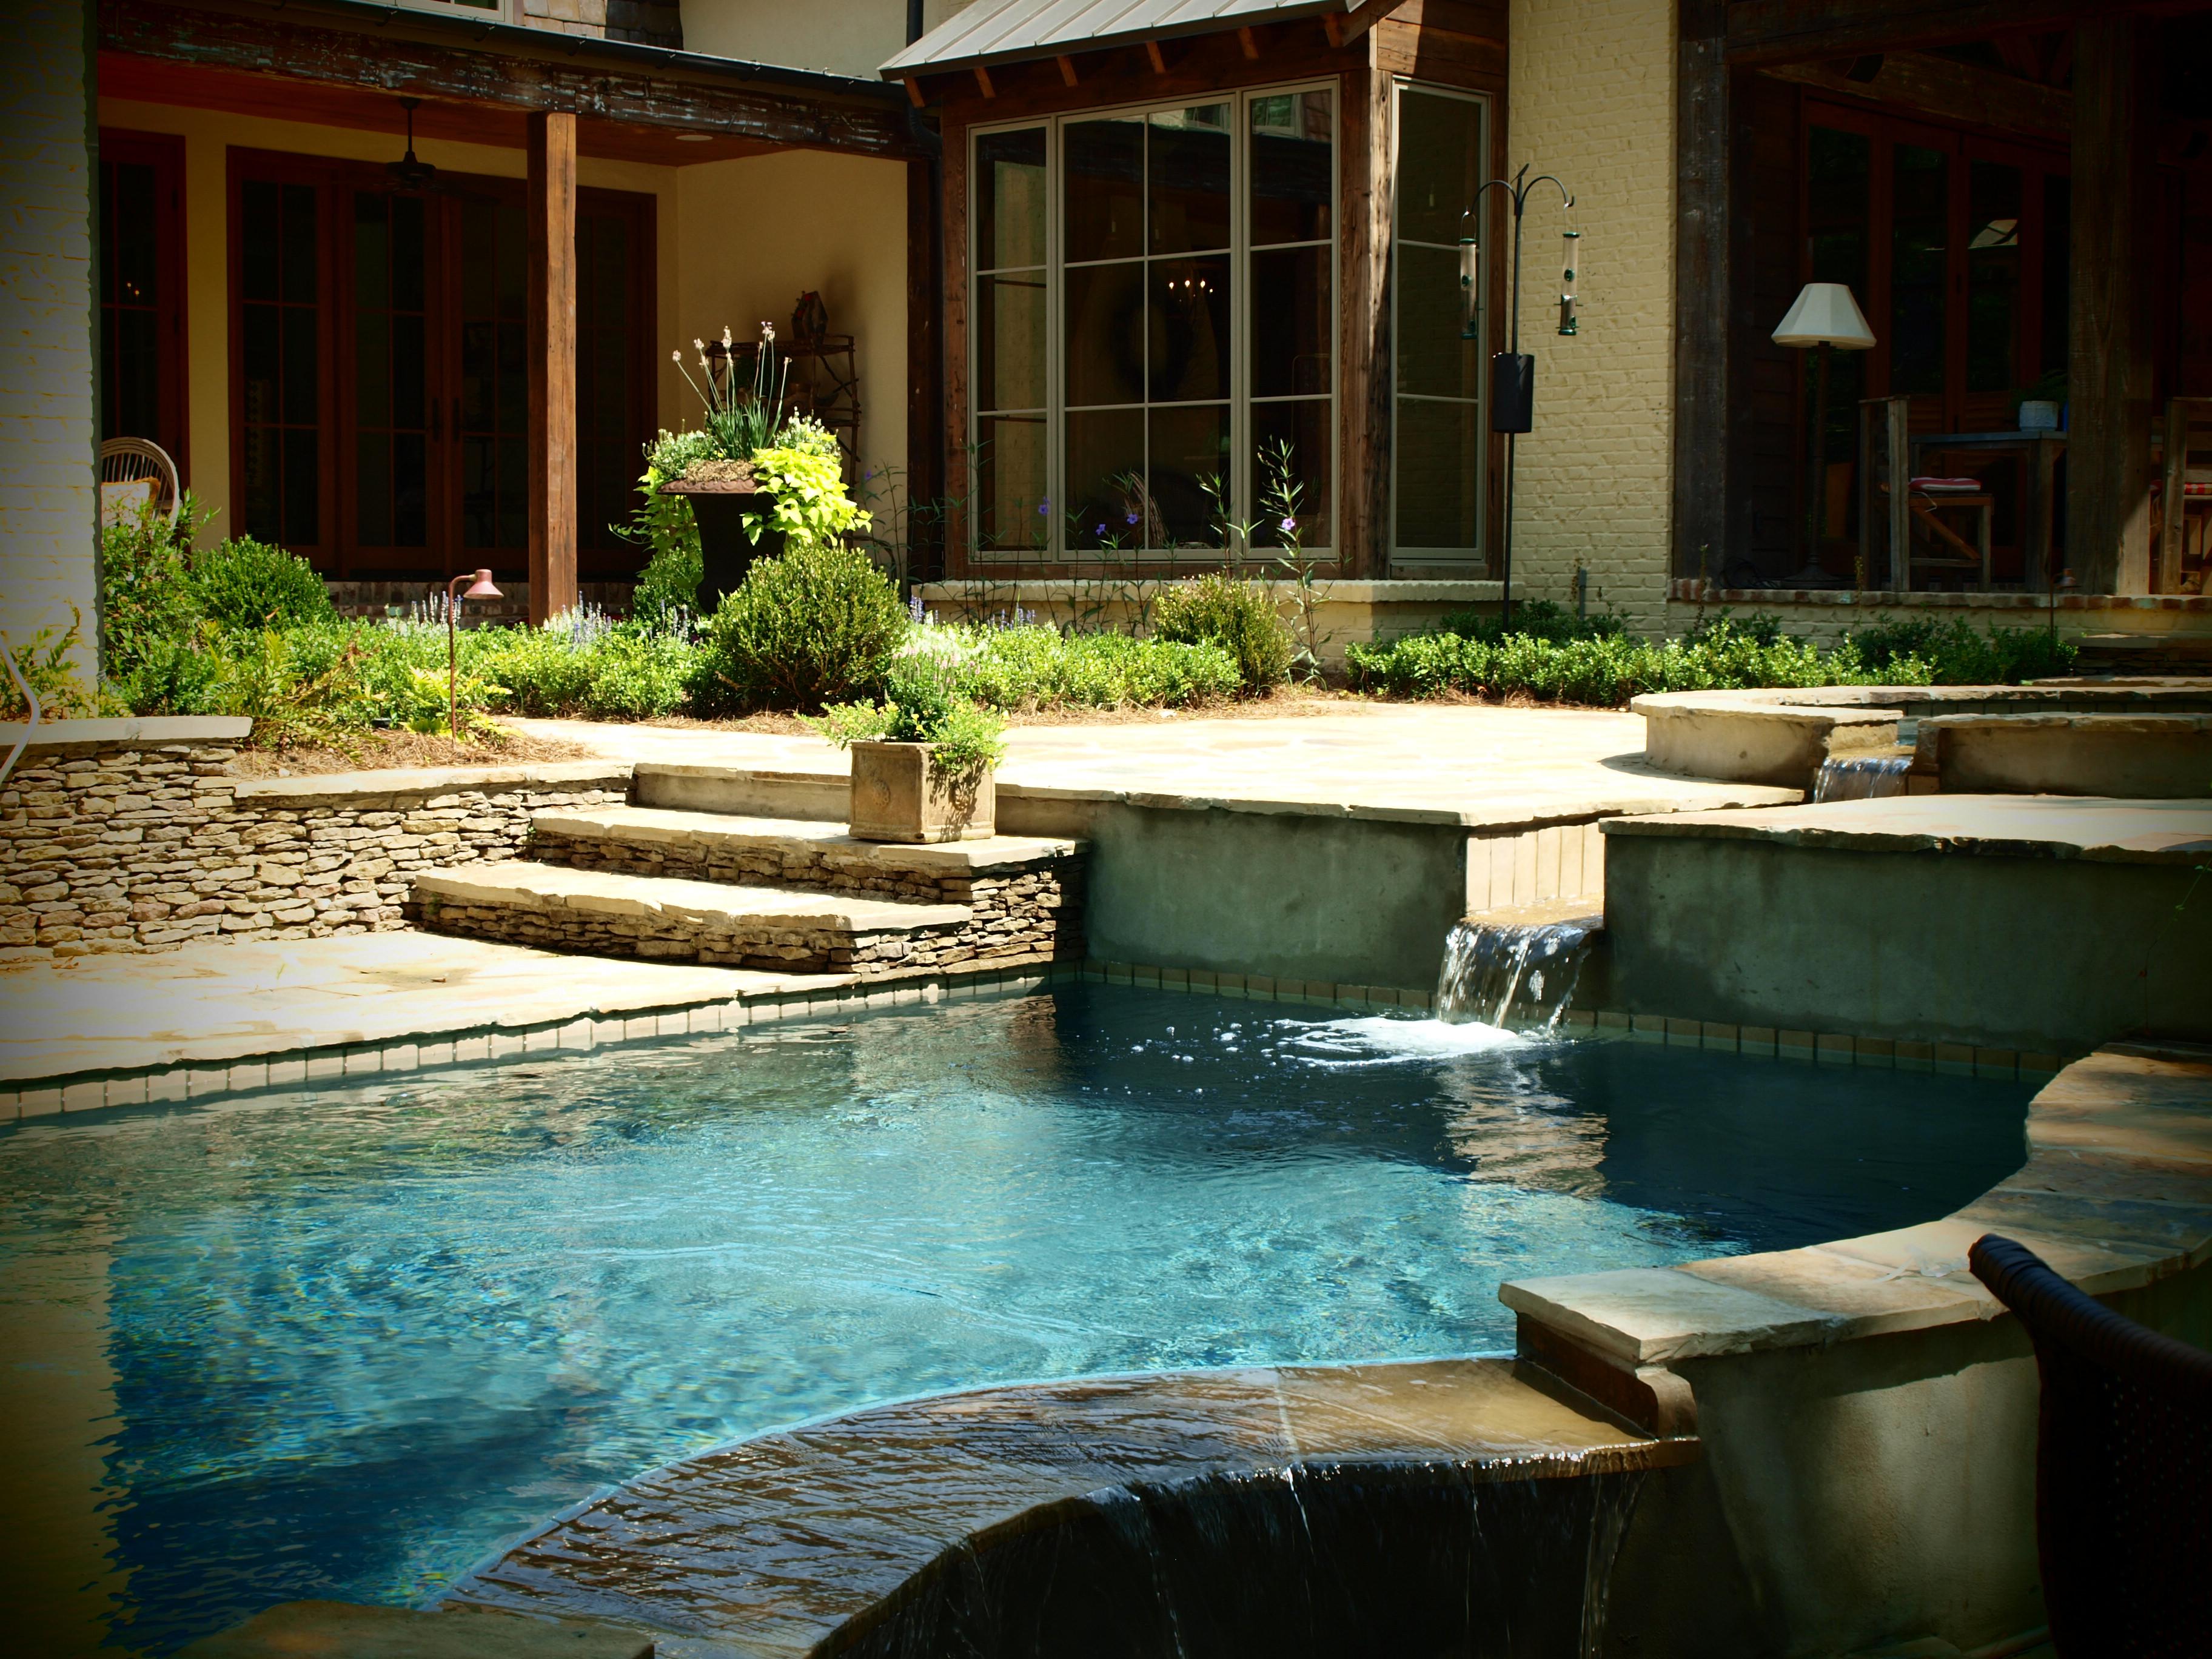 Residential Landscape Architect